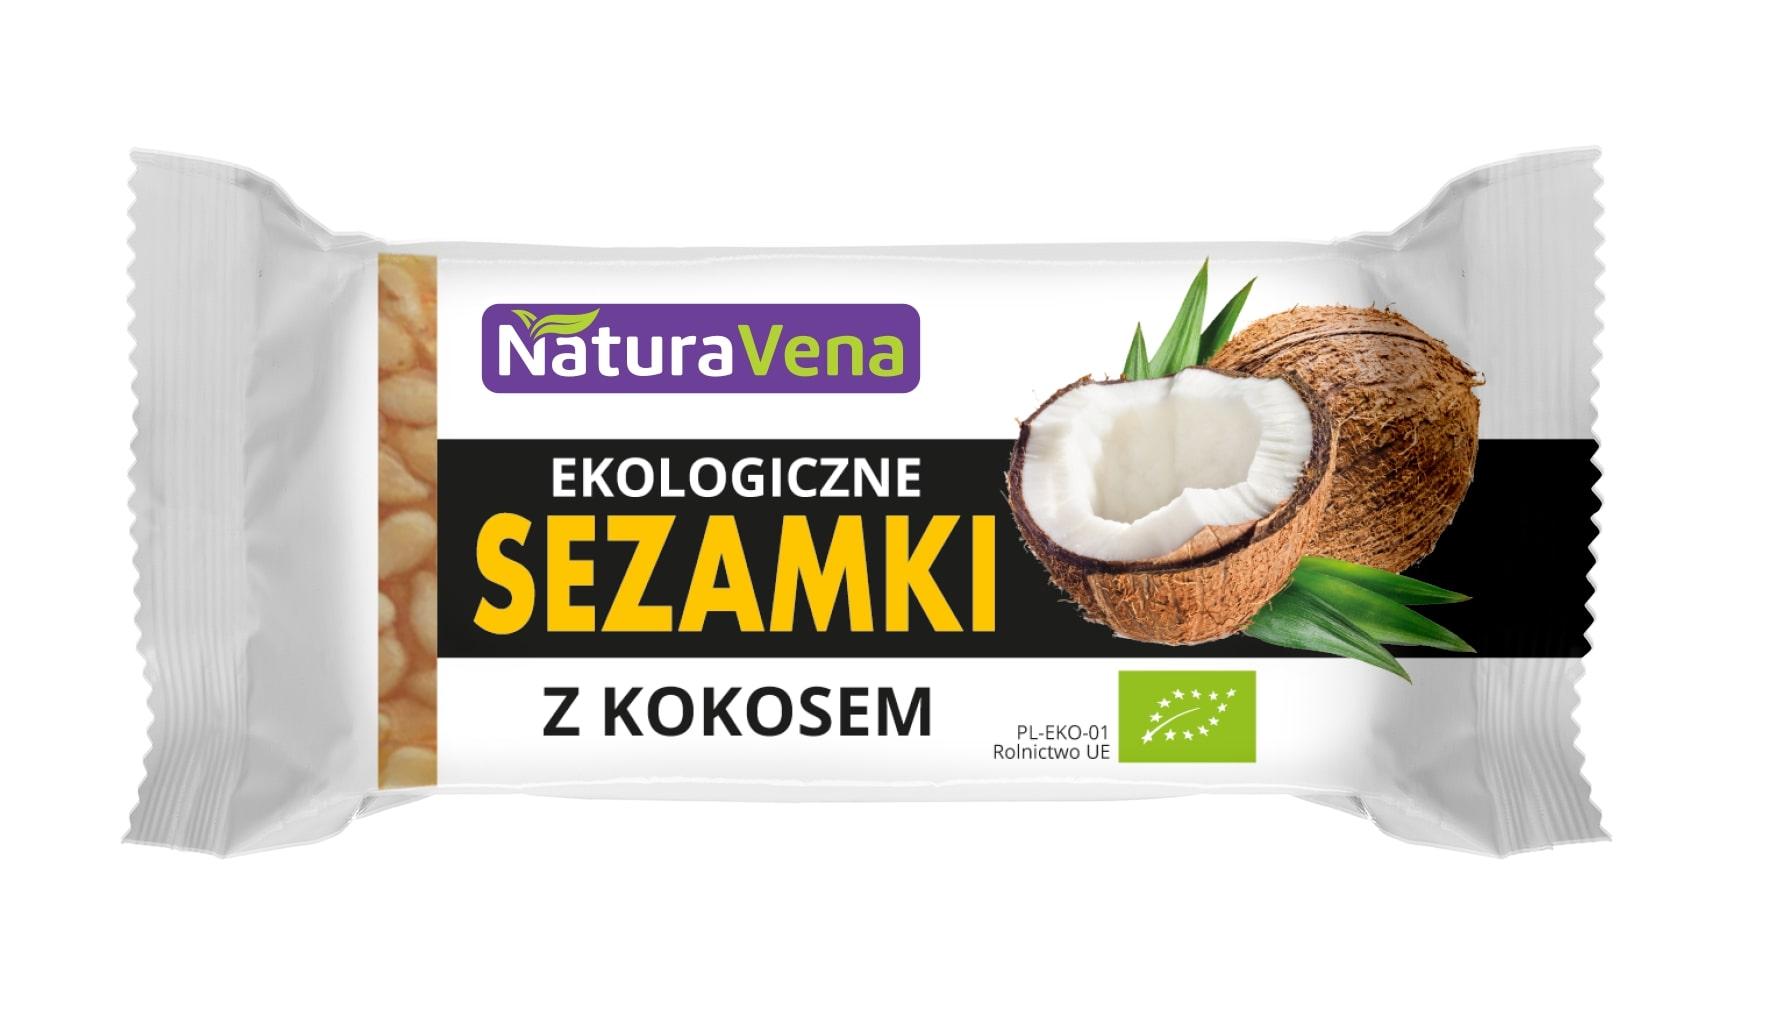 Sezamki z kokosem